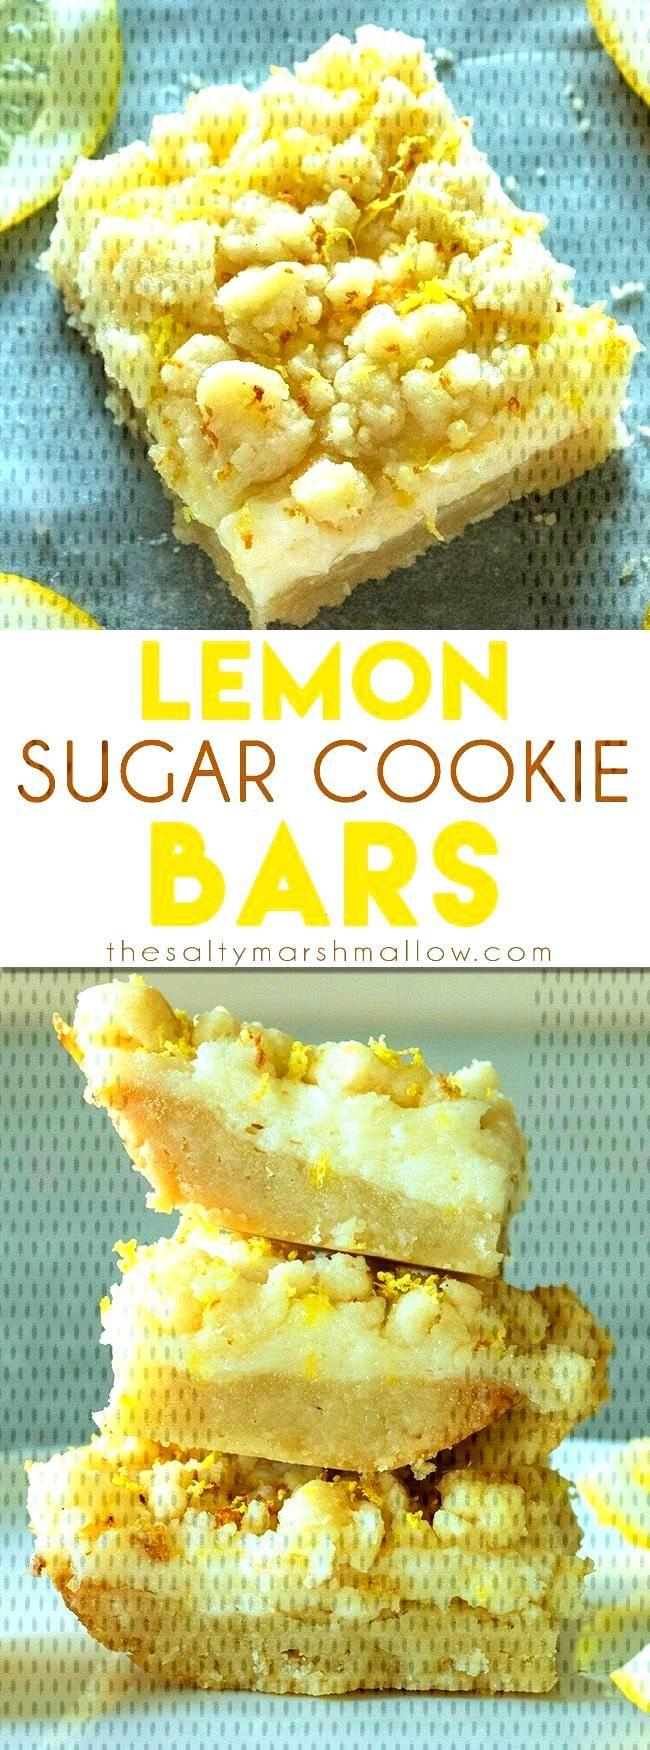 Lemon Sugar Cookie Bars -